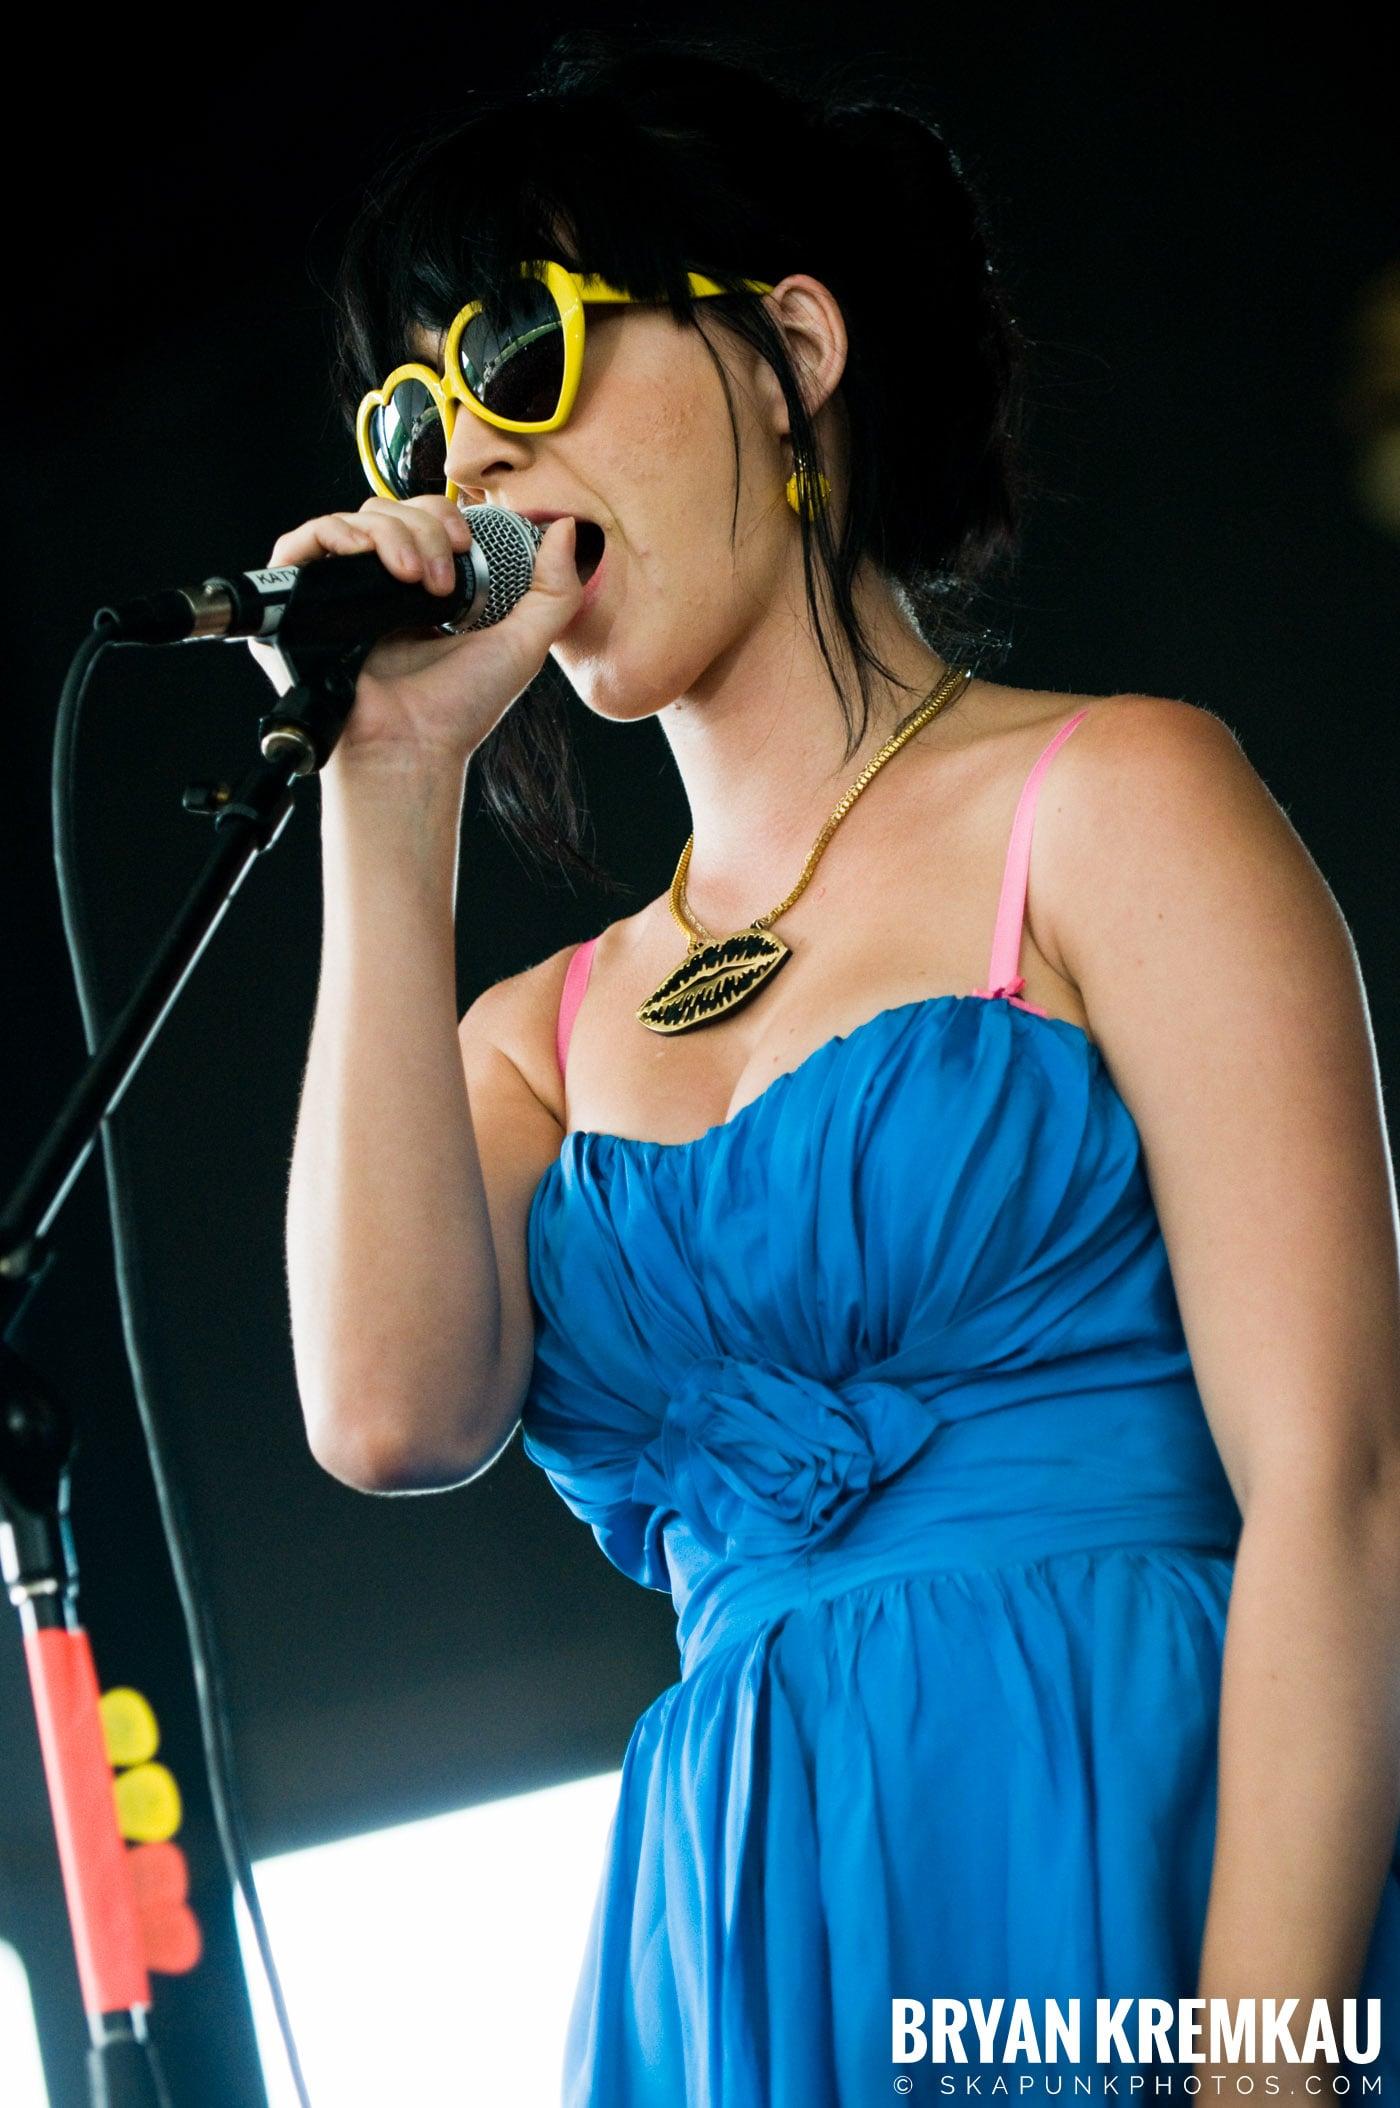 Katy Perry @ Warped Tour, Scranton PA - 7.27.08 (14)